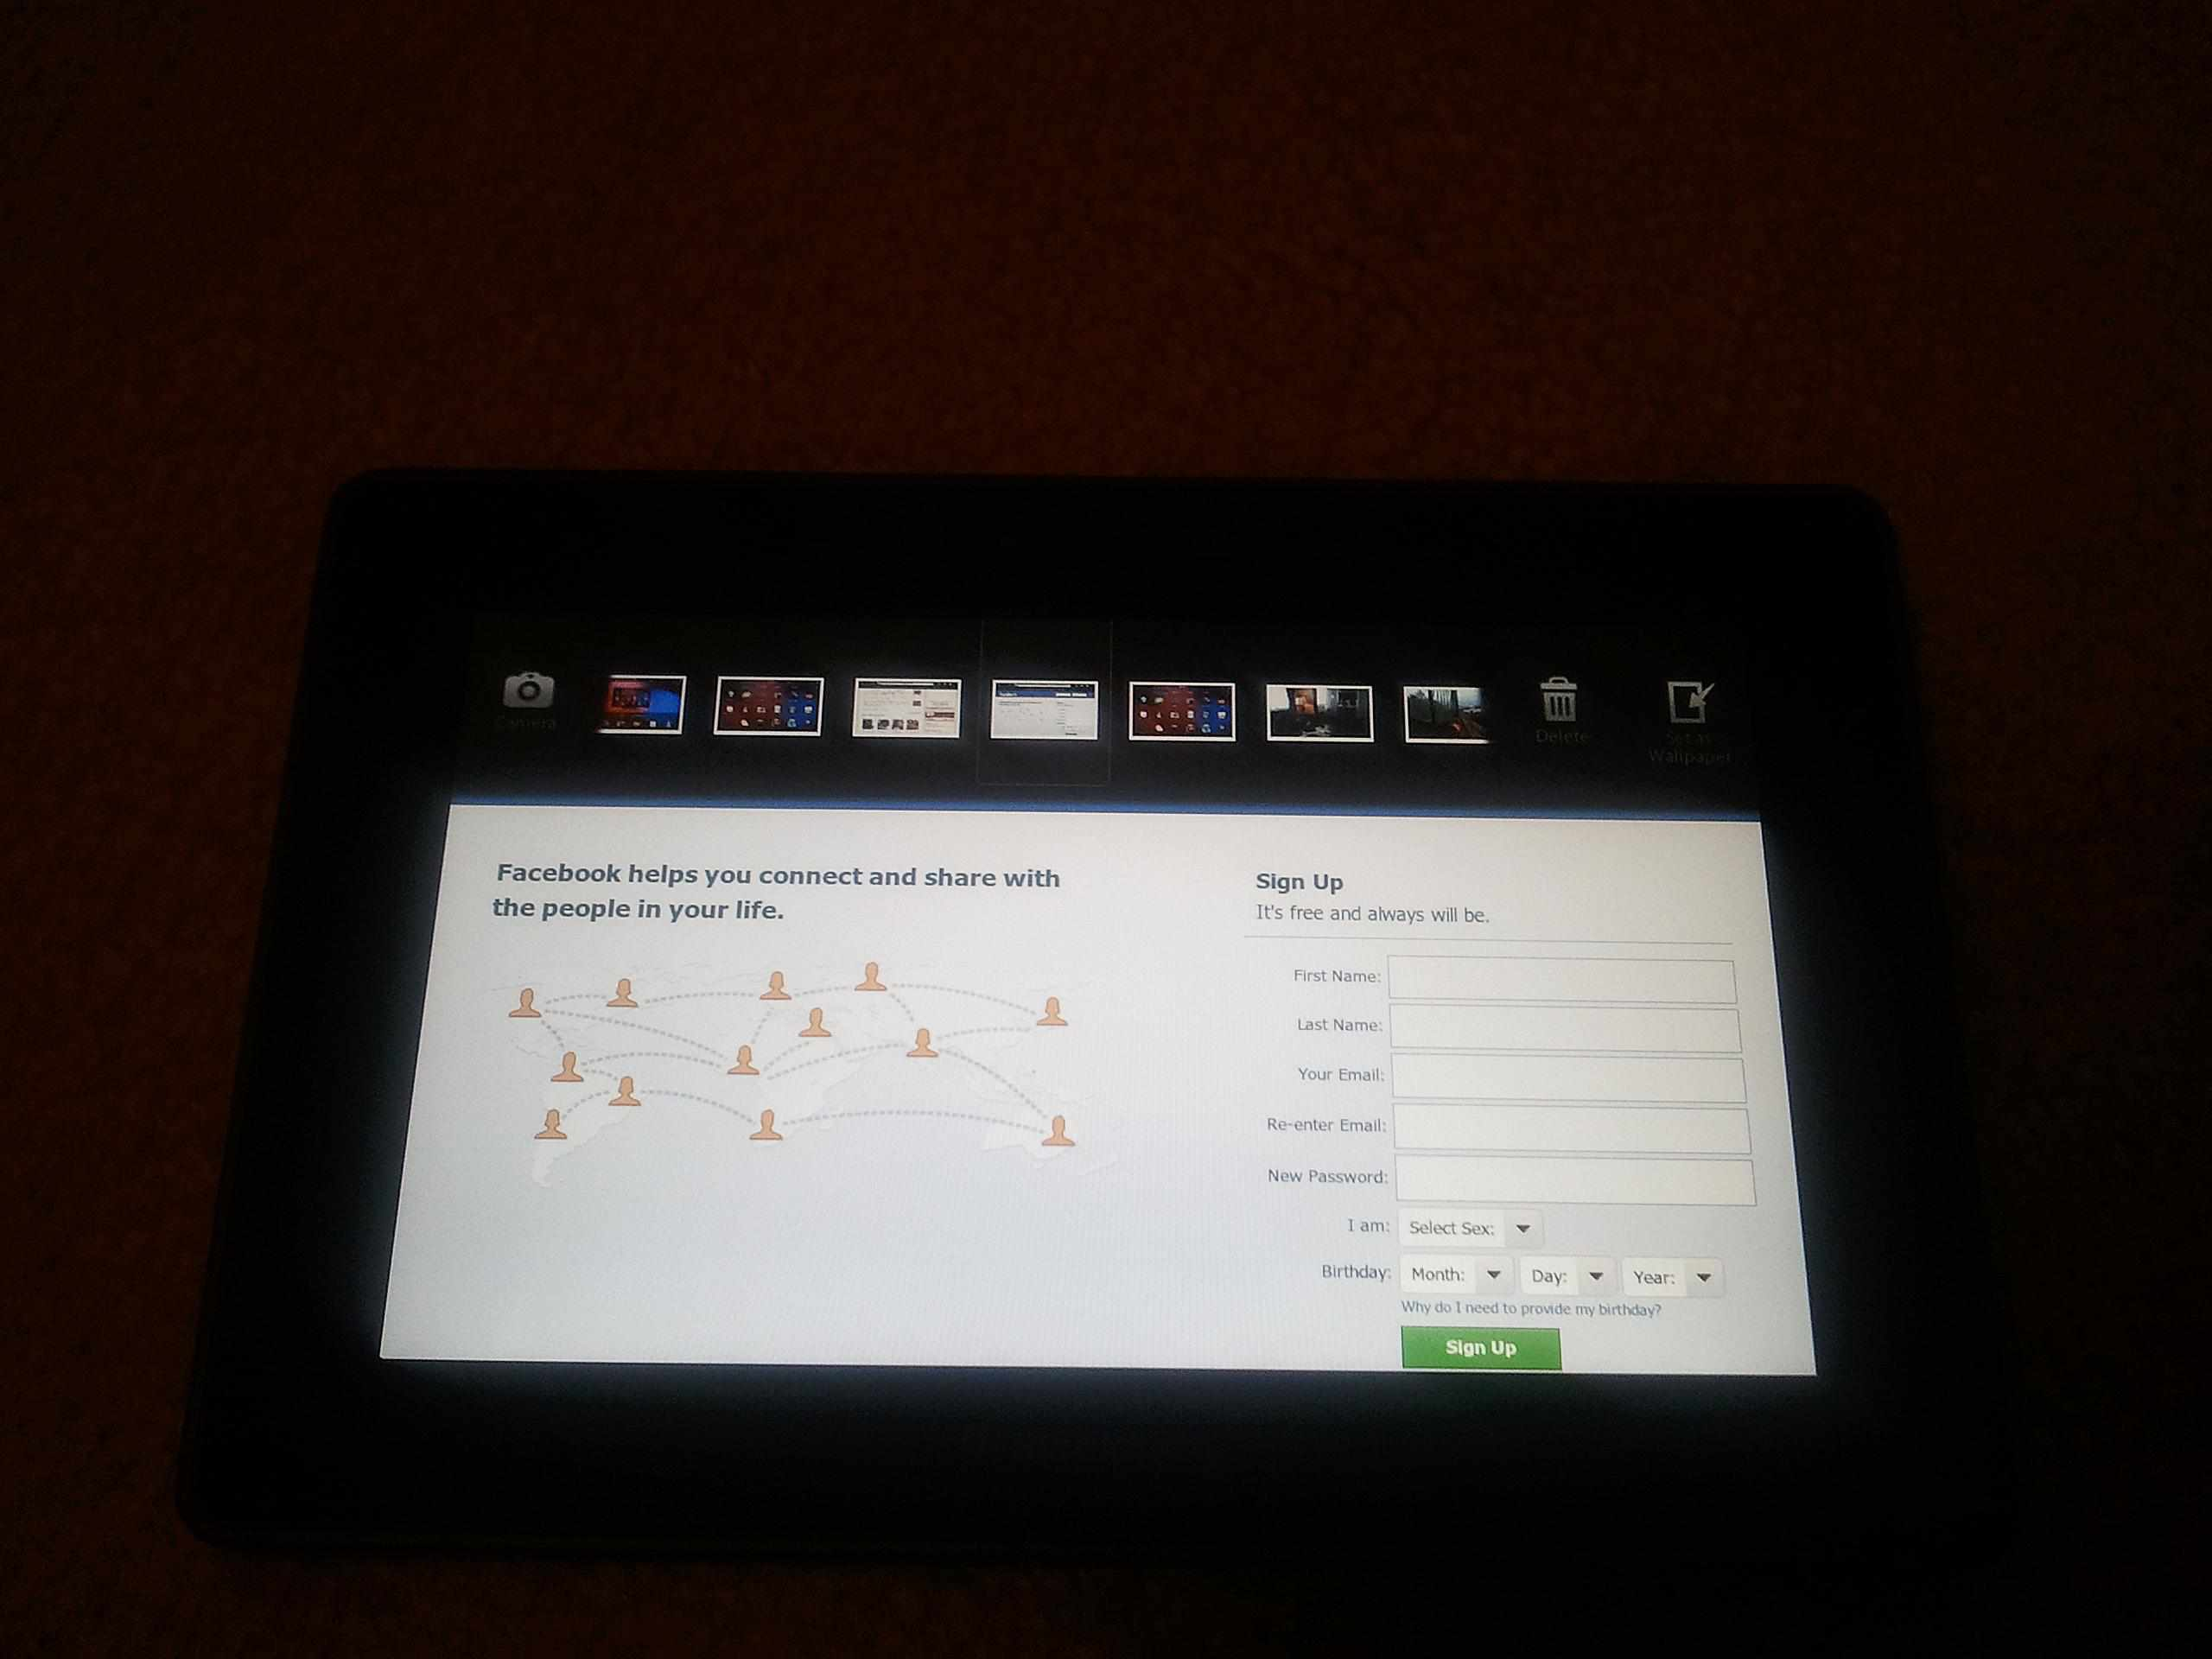 Delete Photos on BlackBerry PlayBook - Swipe Downward